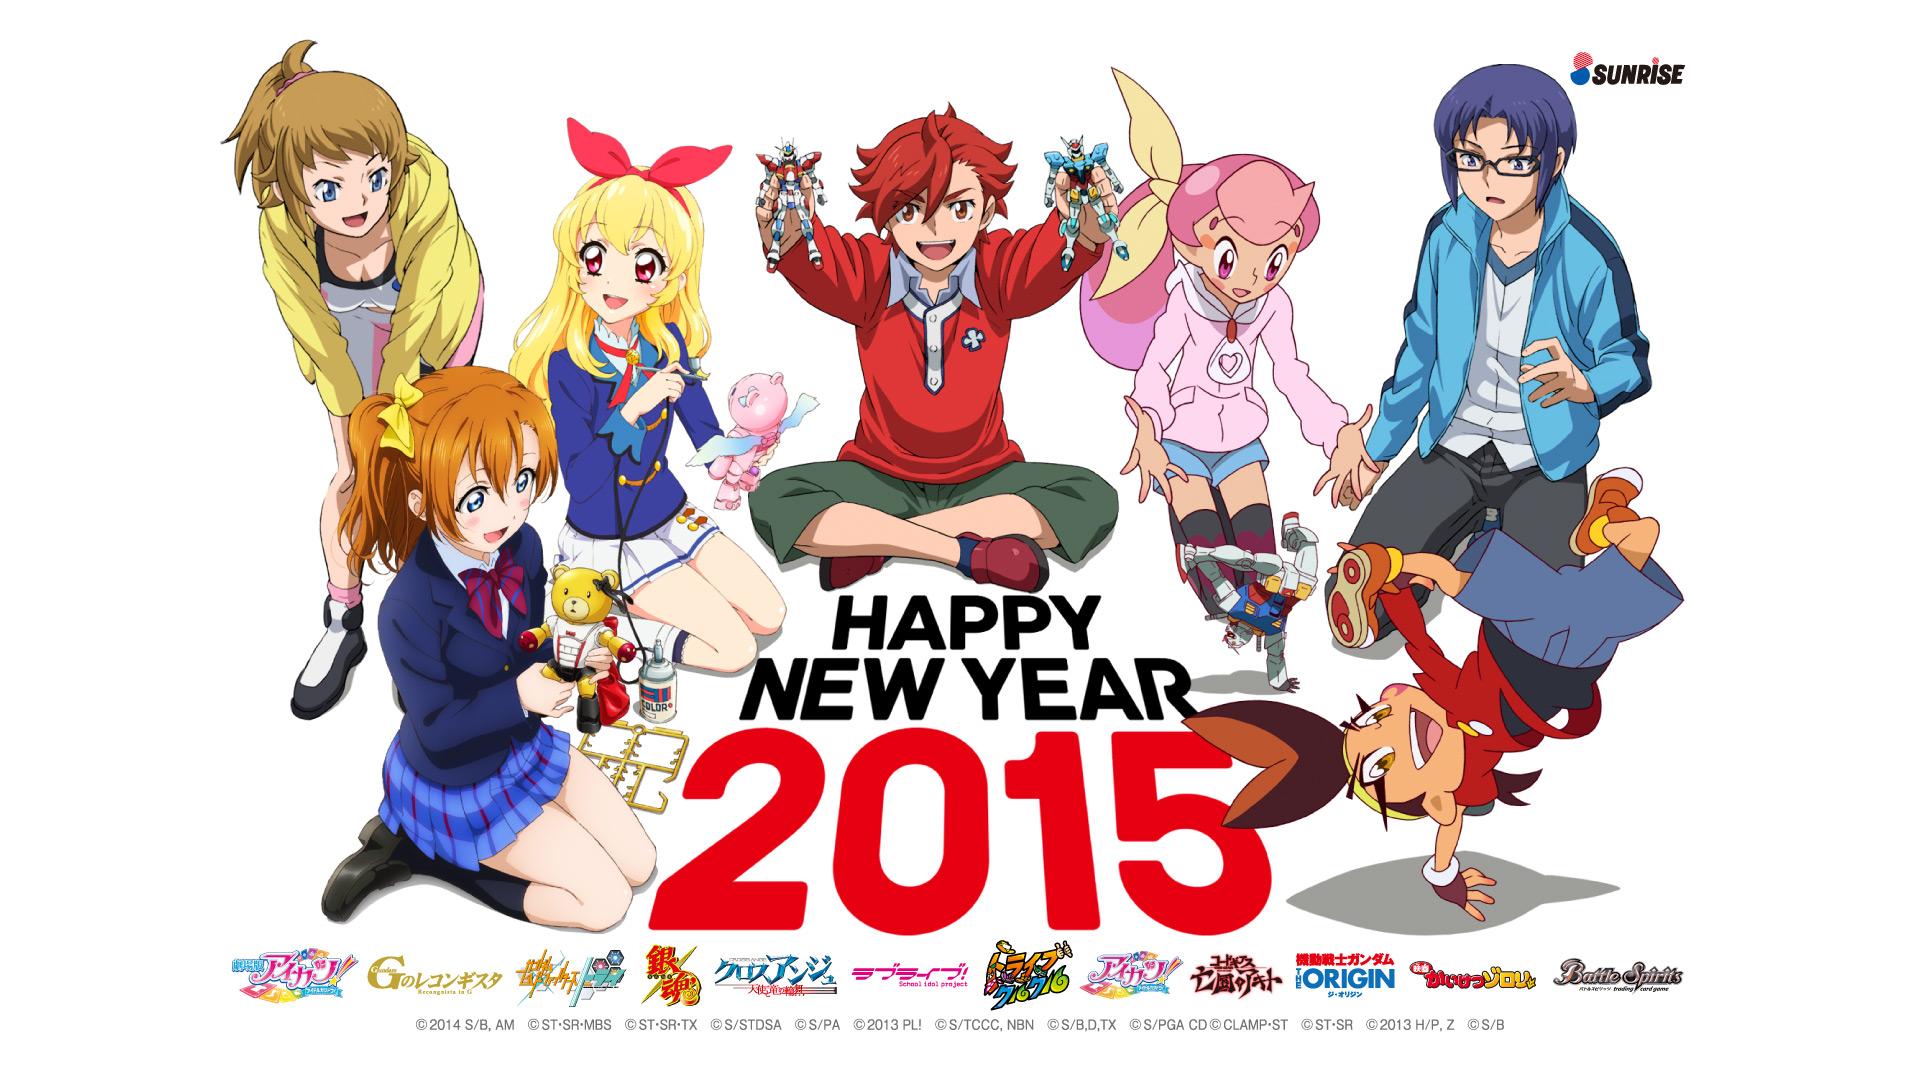 2015 New Year Greetings Anime Style haruhichan.com sunrise